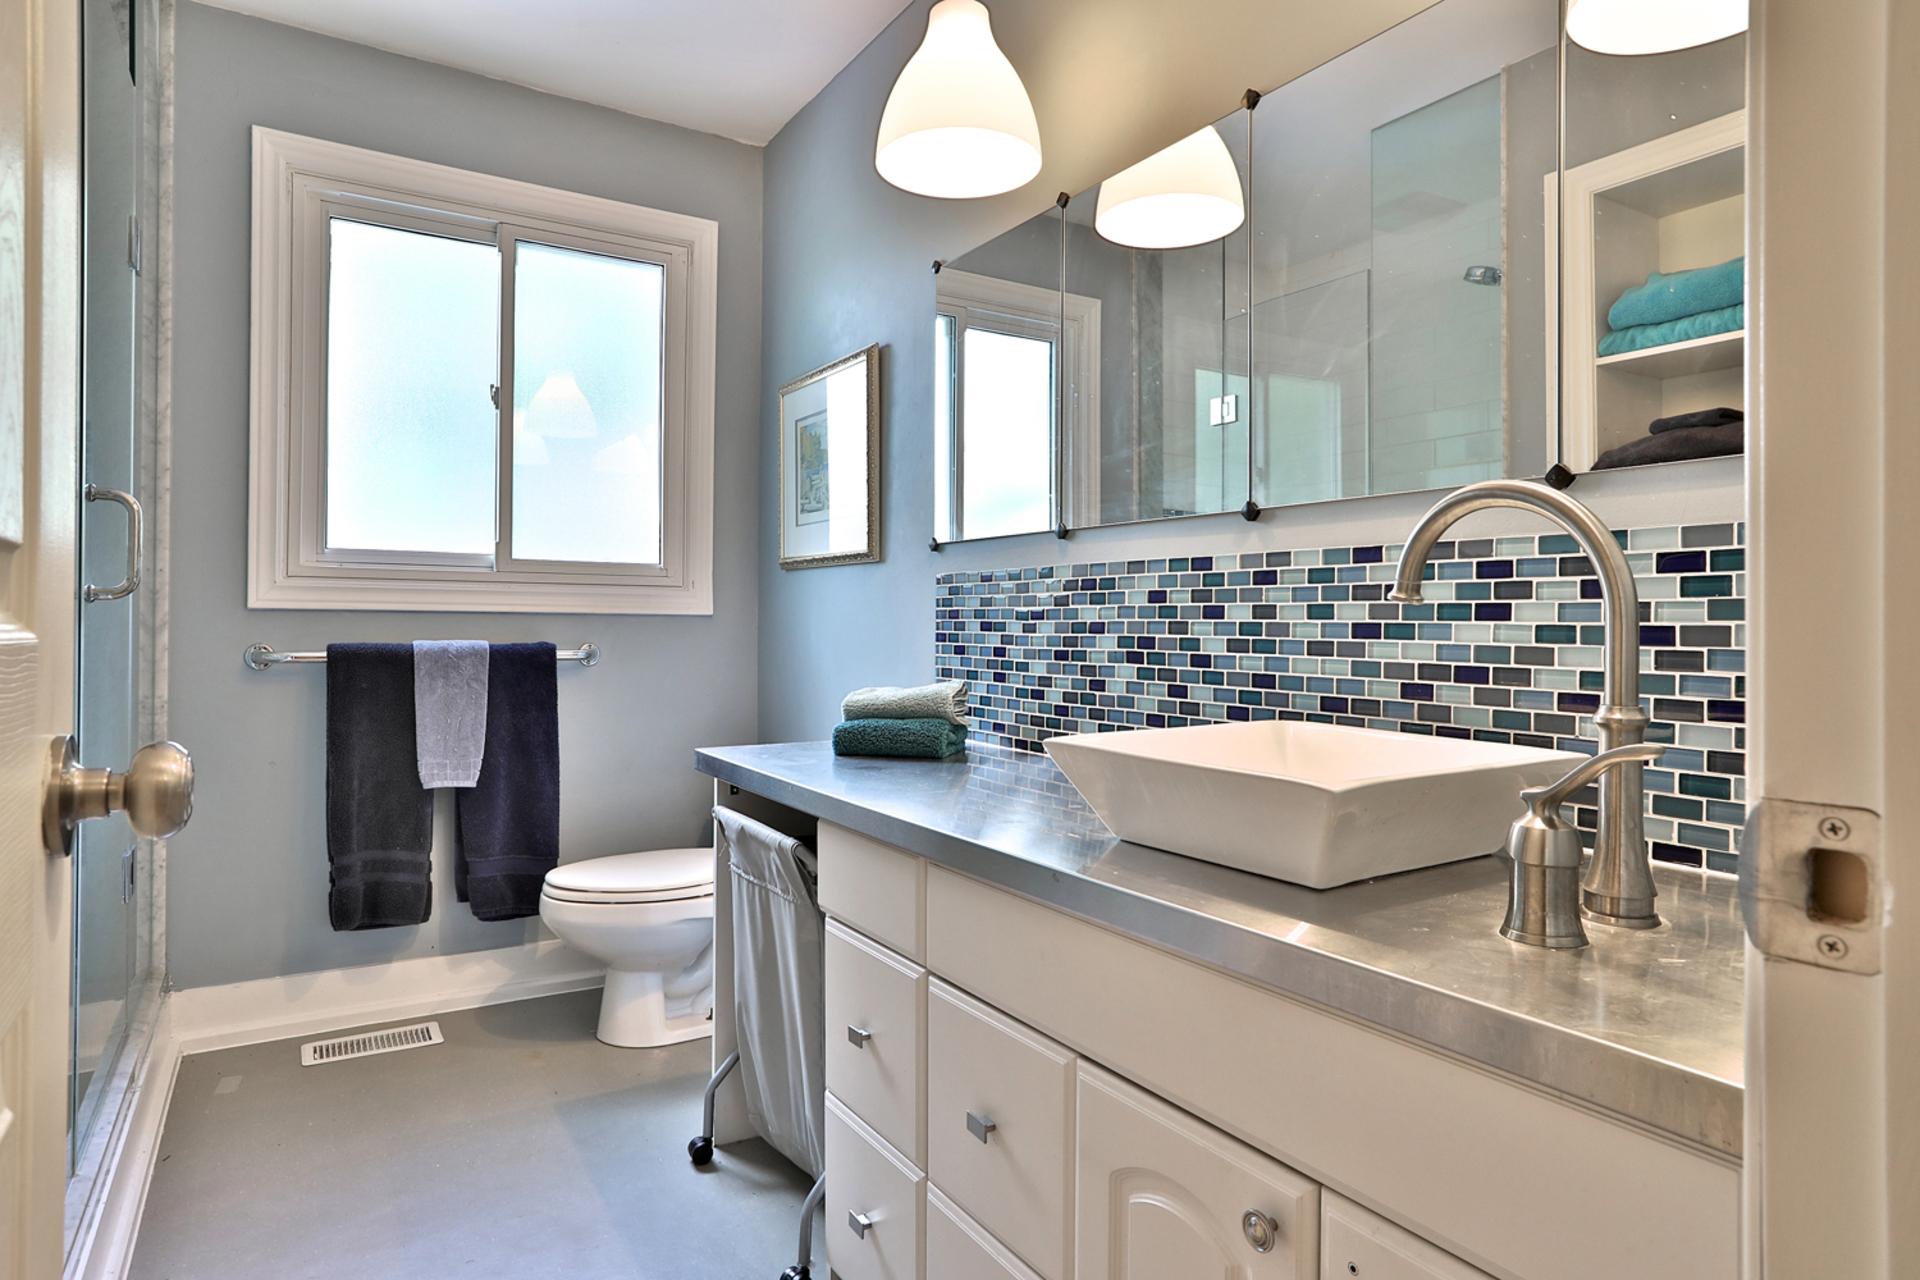 3 Piece Bathroom at 32 Geraldine Court, Parkwoods-Donalda, Toronto